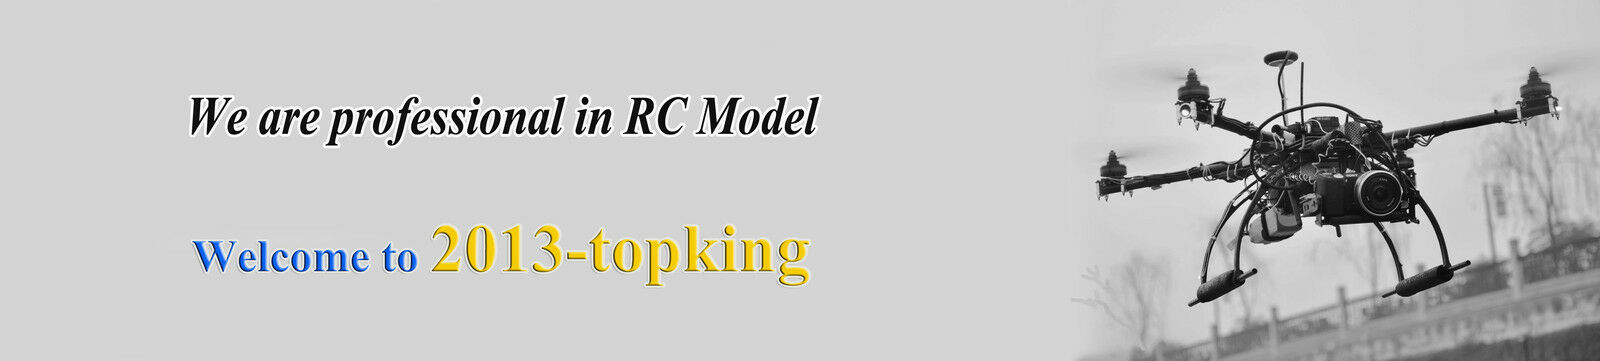 2013-topking